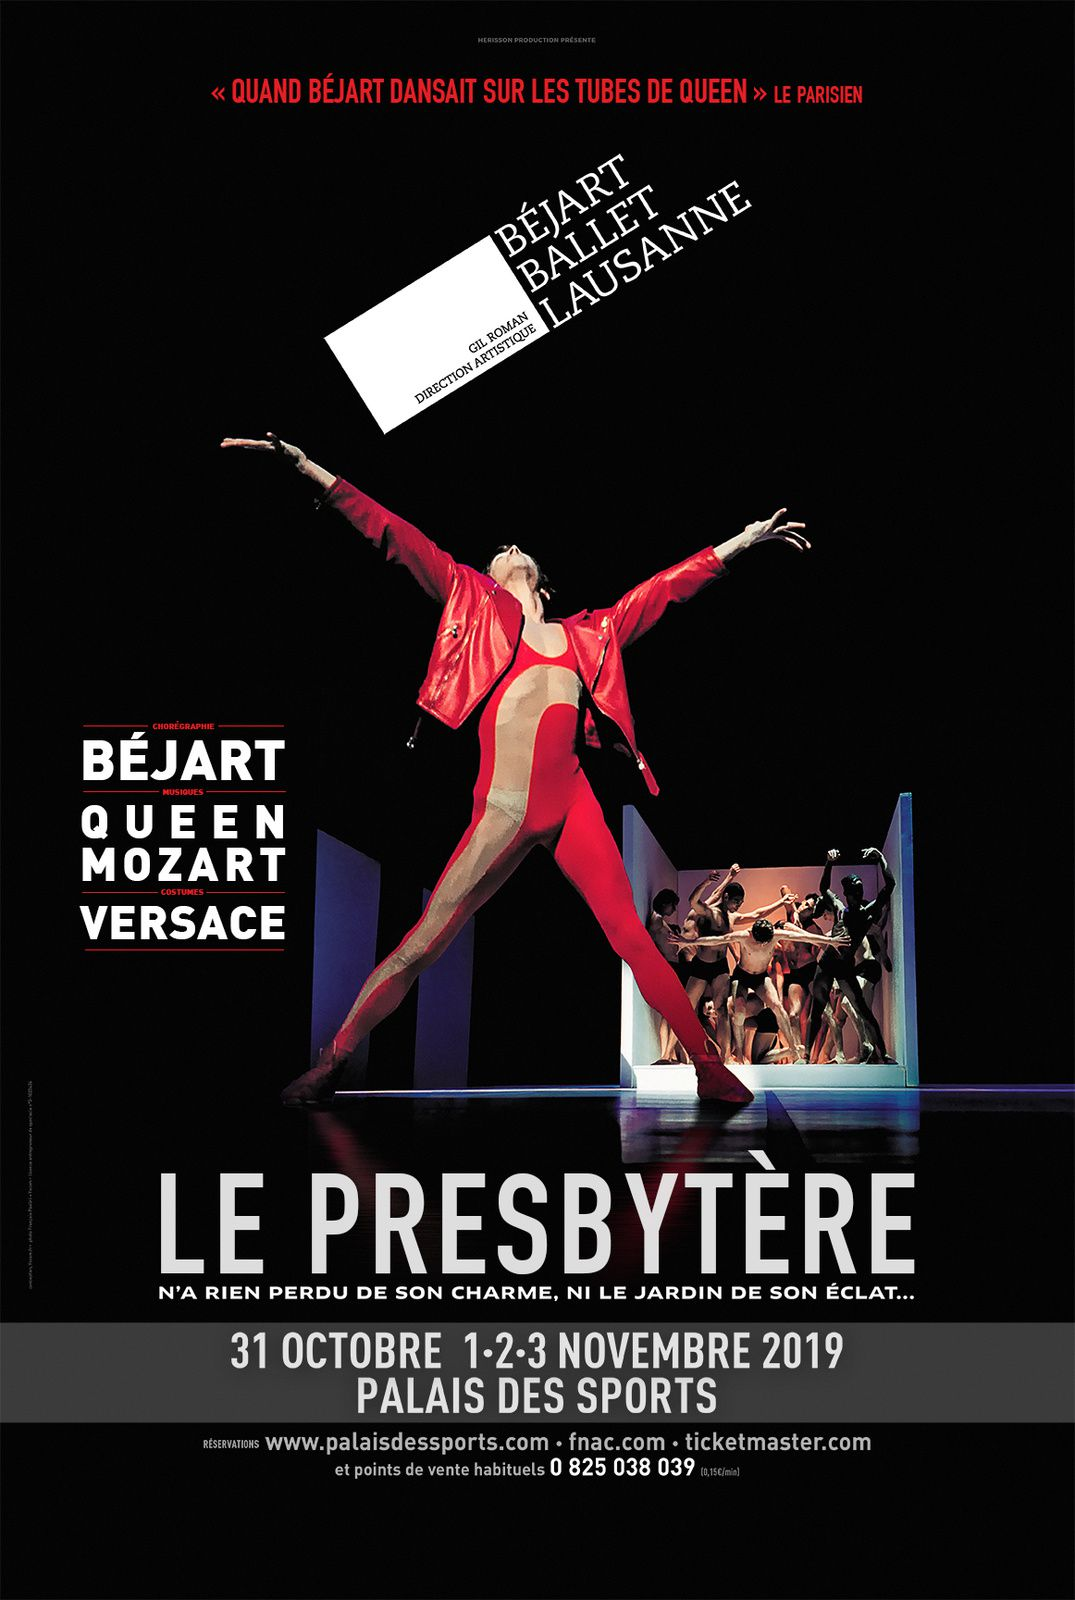 Béjart Ballet Lausanne - Palais des sports - Le presbytère